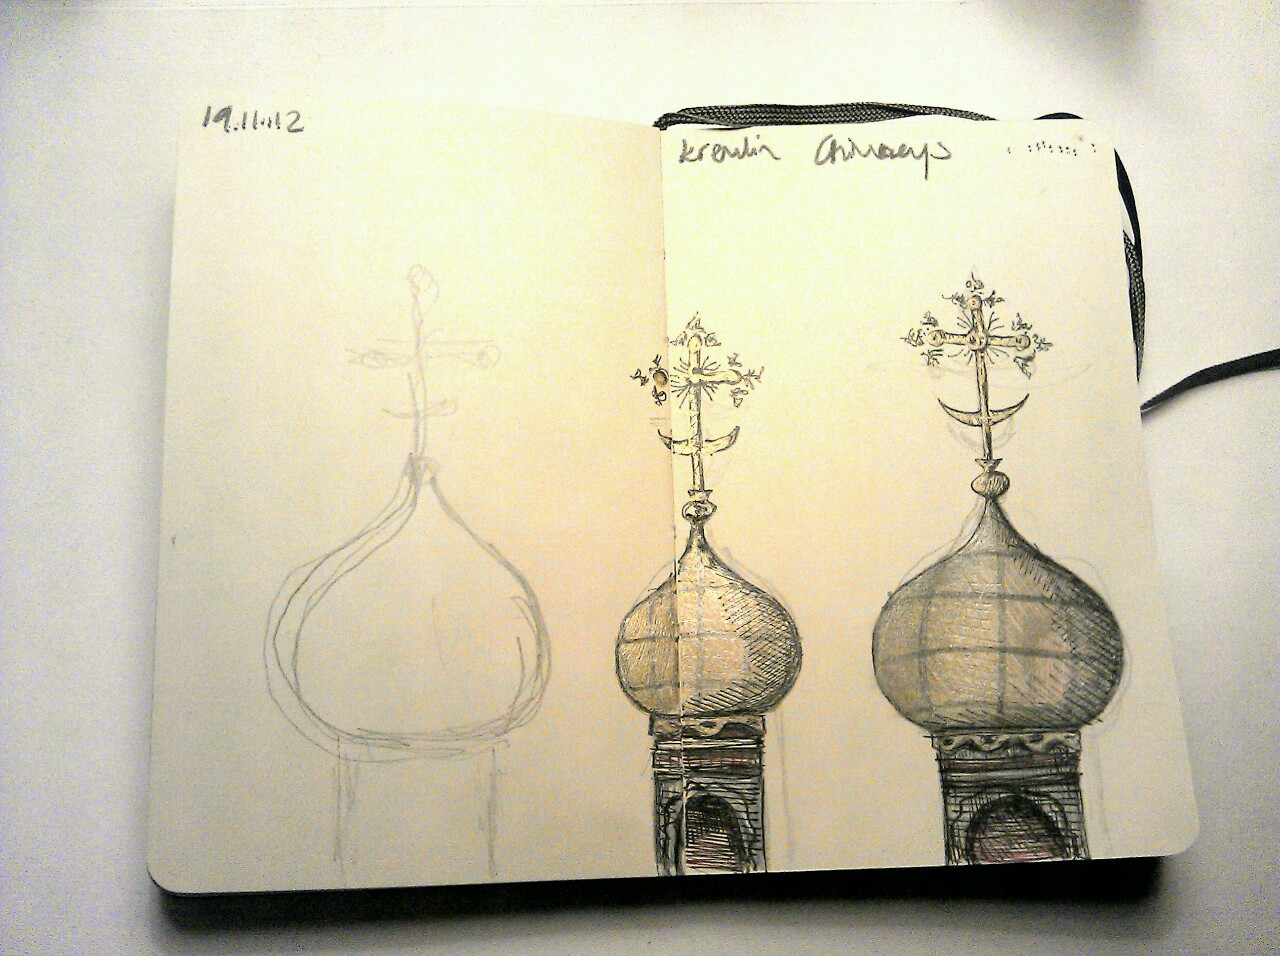 365 drawings later … day 293 … kremlin chimneys